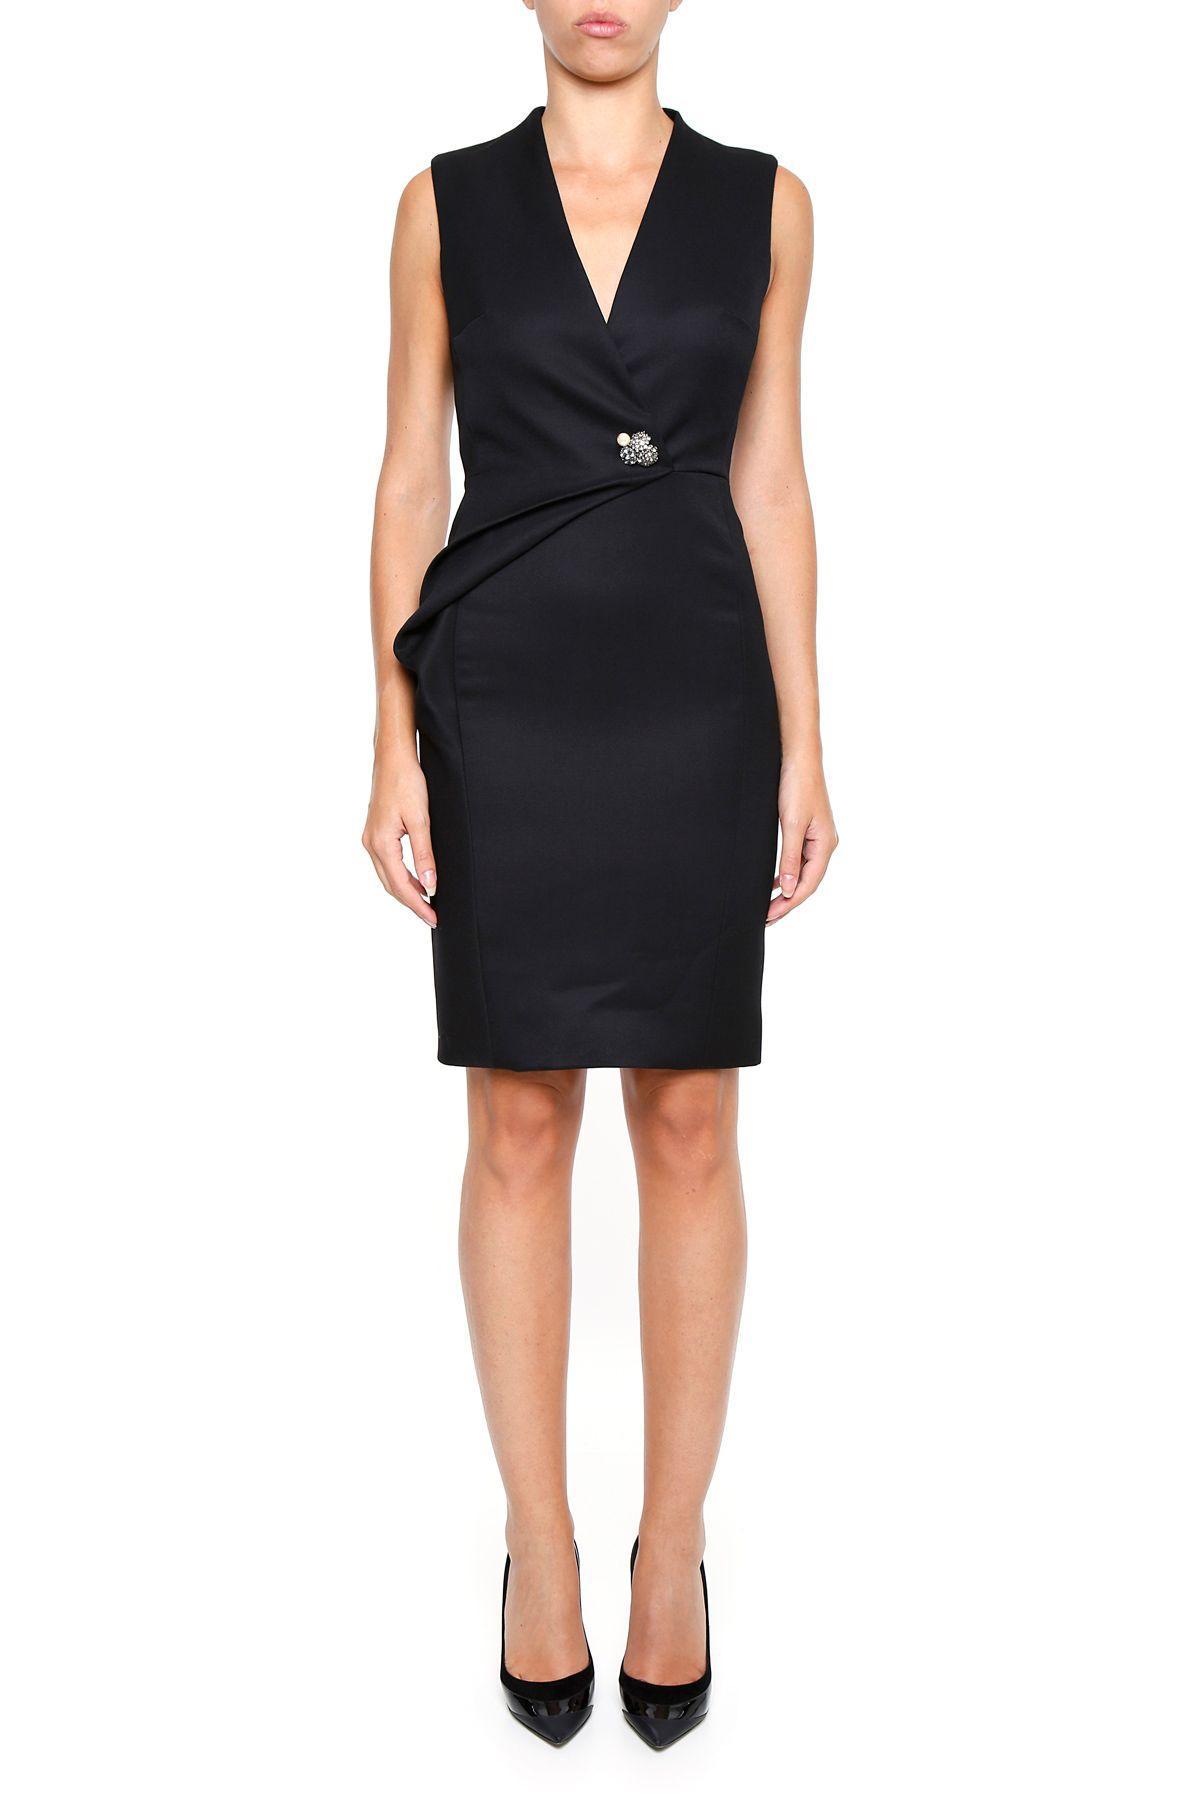 Lanvin Embellished Dress In Blacknero